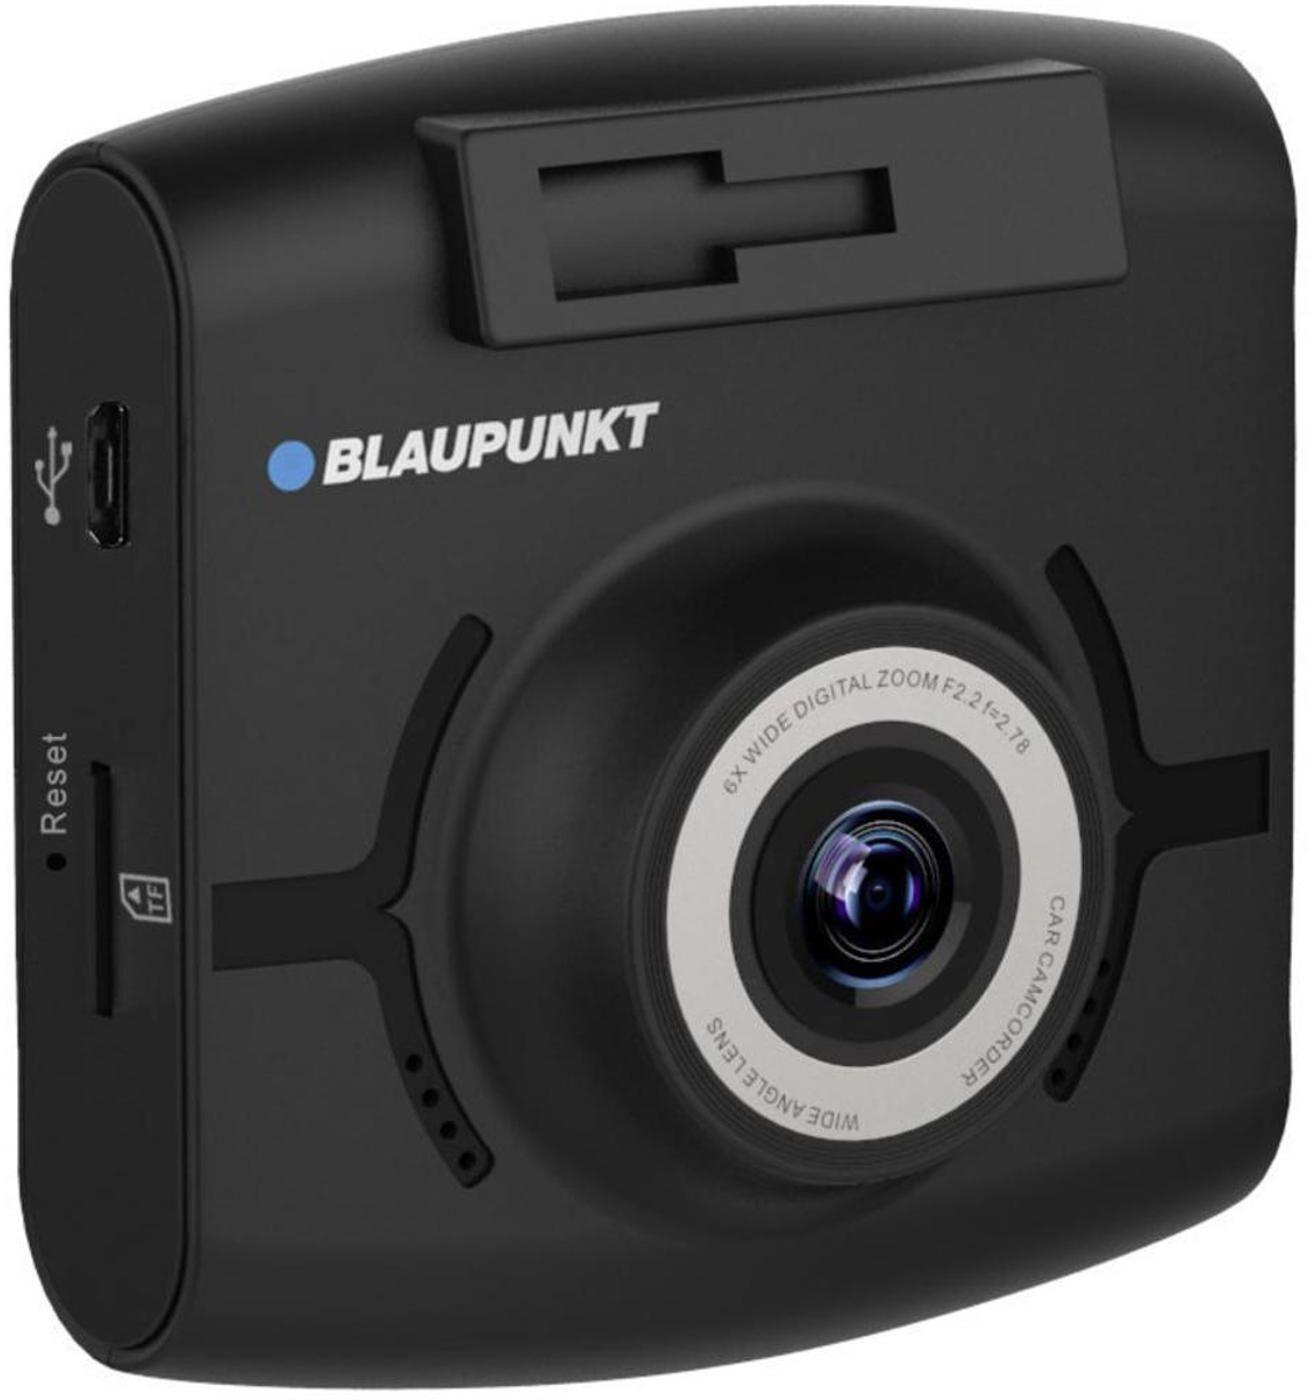 Blaupunkt Cyfrowy rejestrator wideo Blaupunkt BP 2.1 FHD | Full HD - BP 2.1 FHD videoreģistrātors